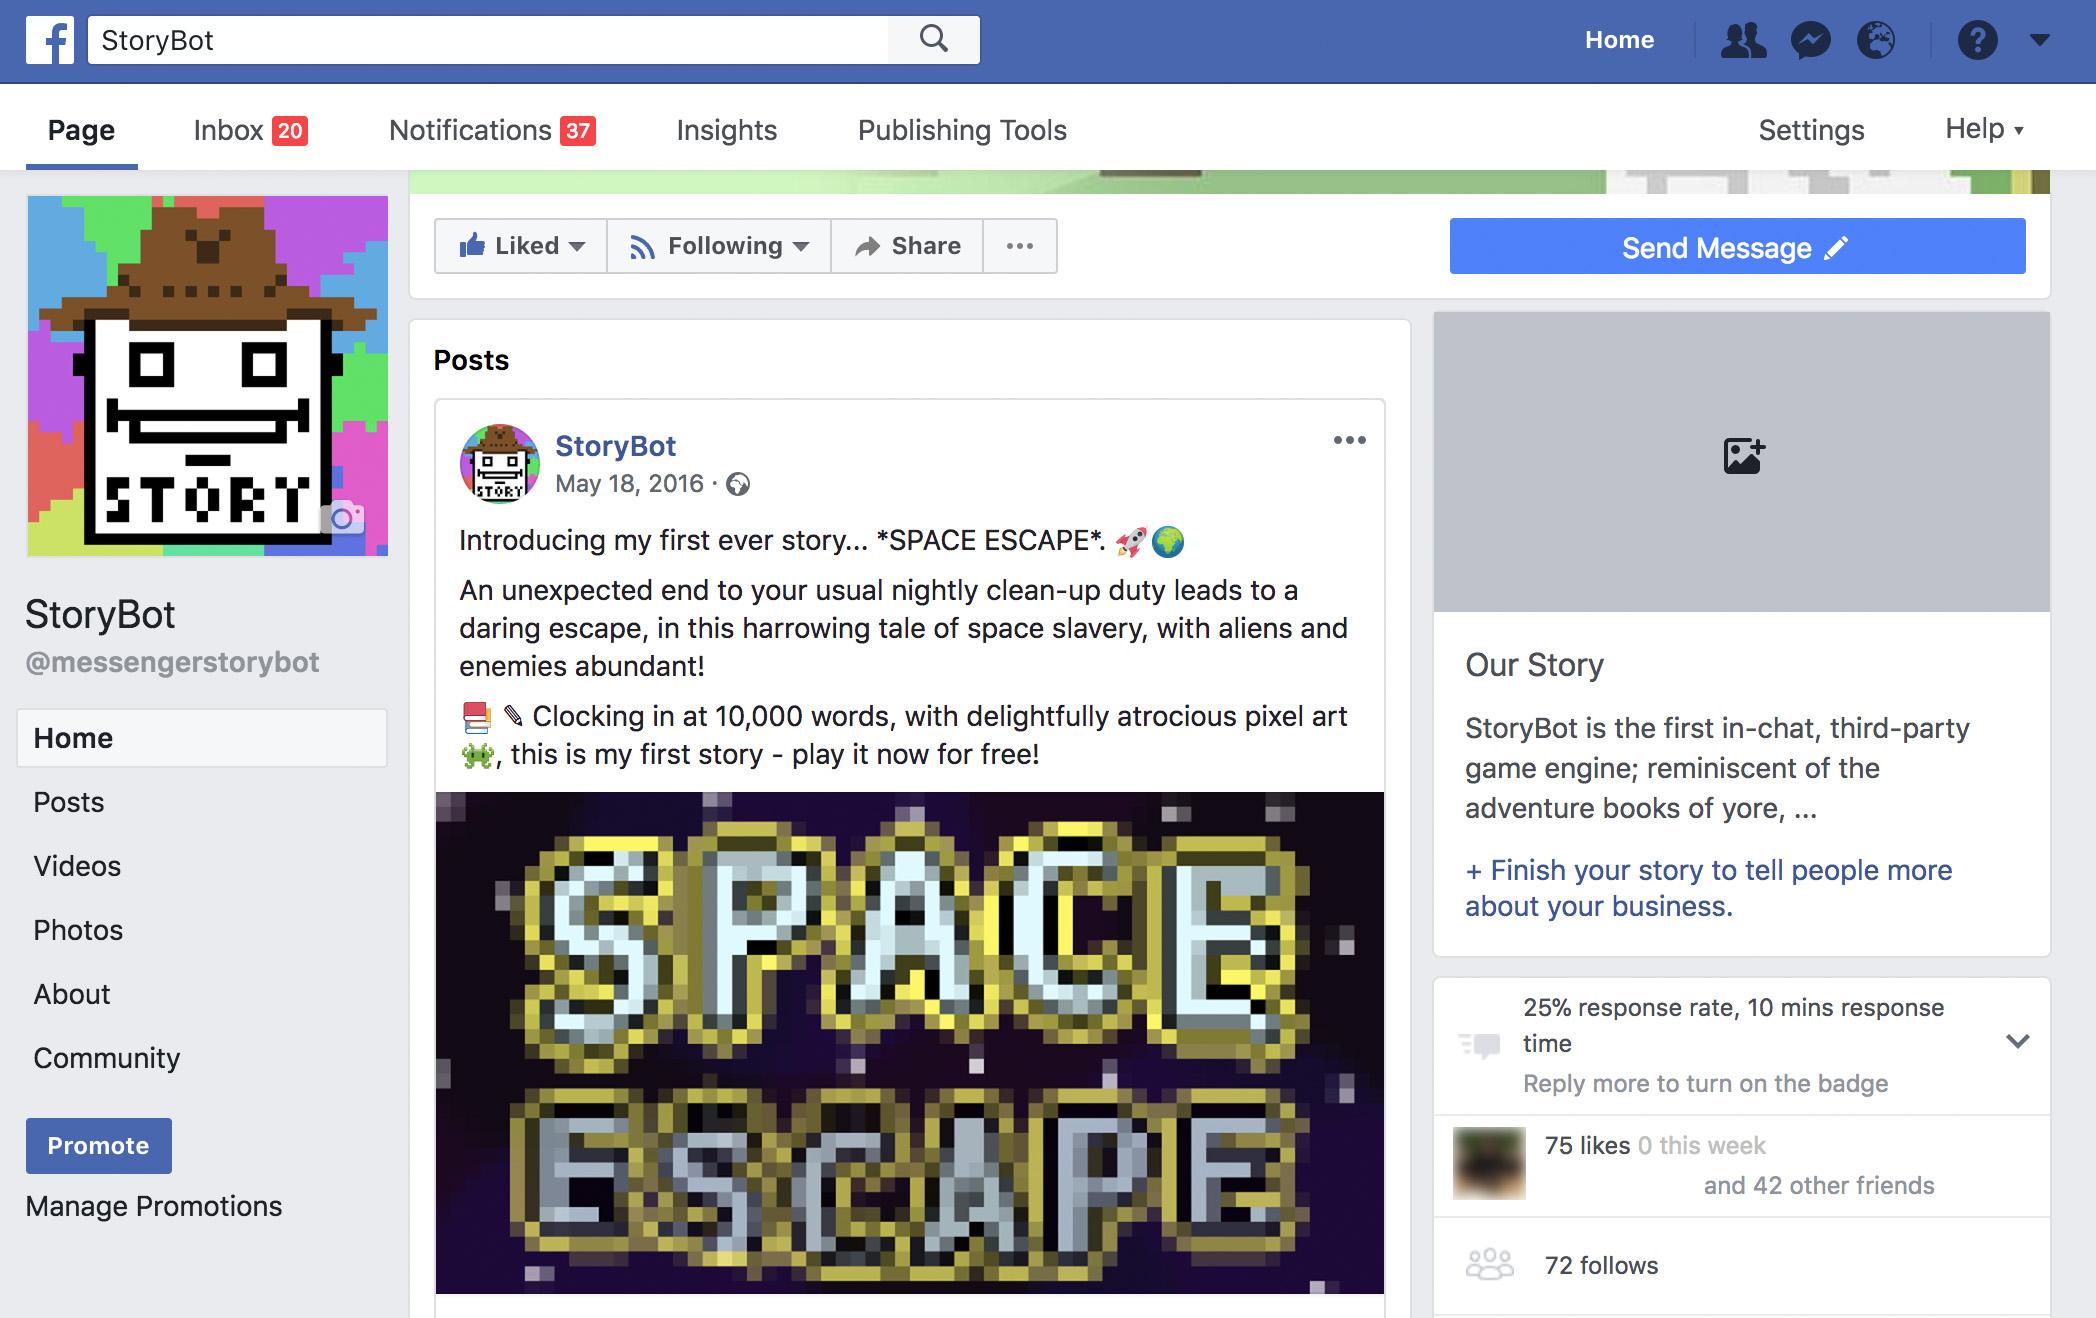 StoryBot Facebook